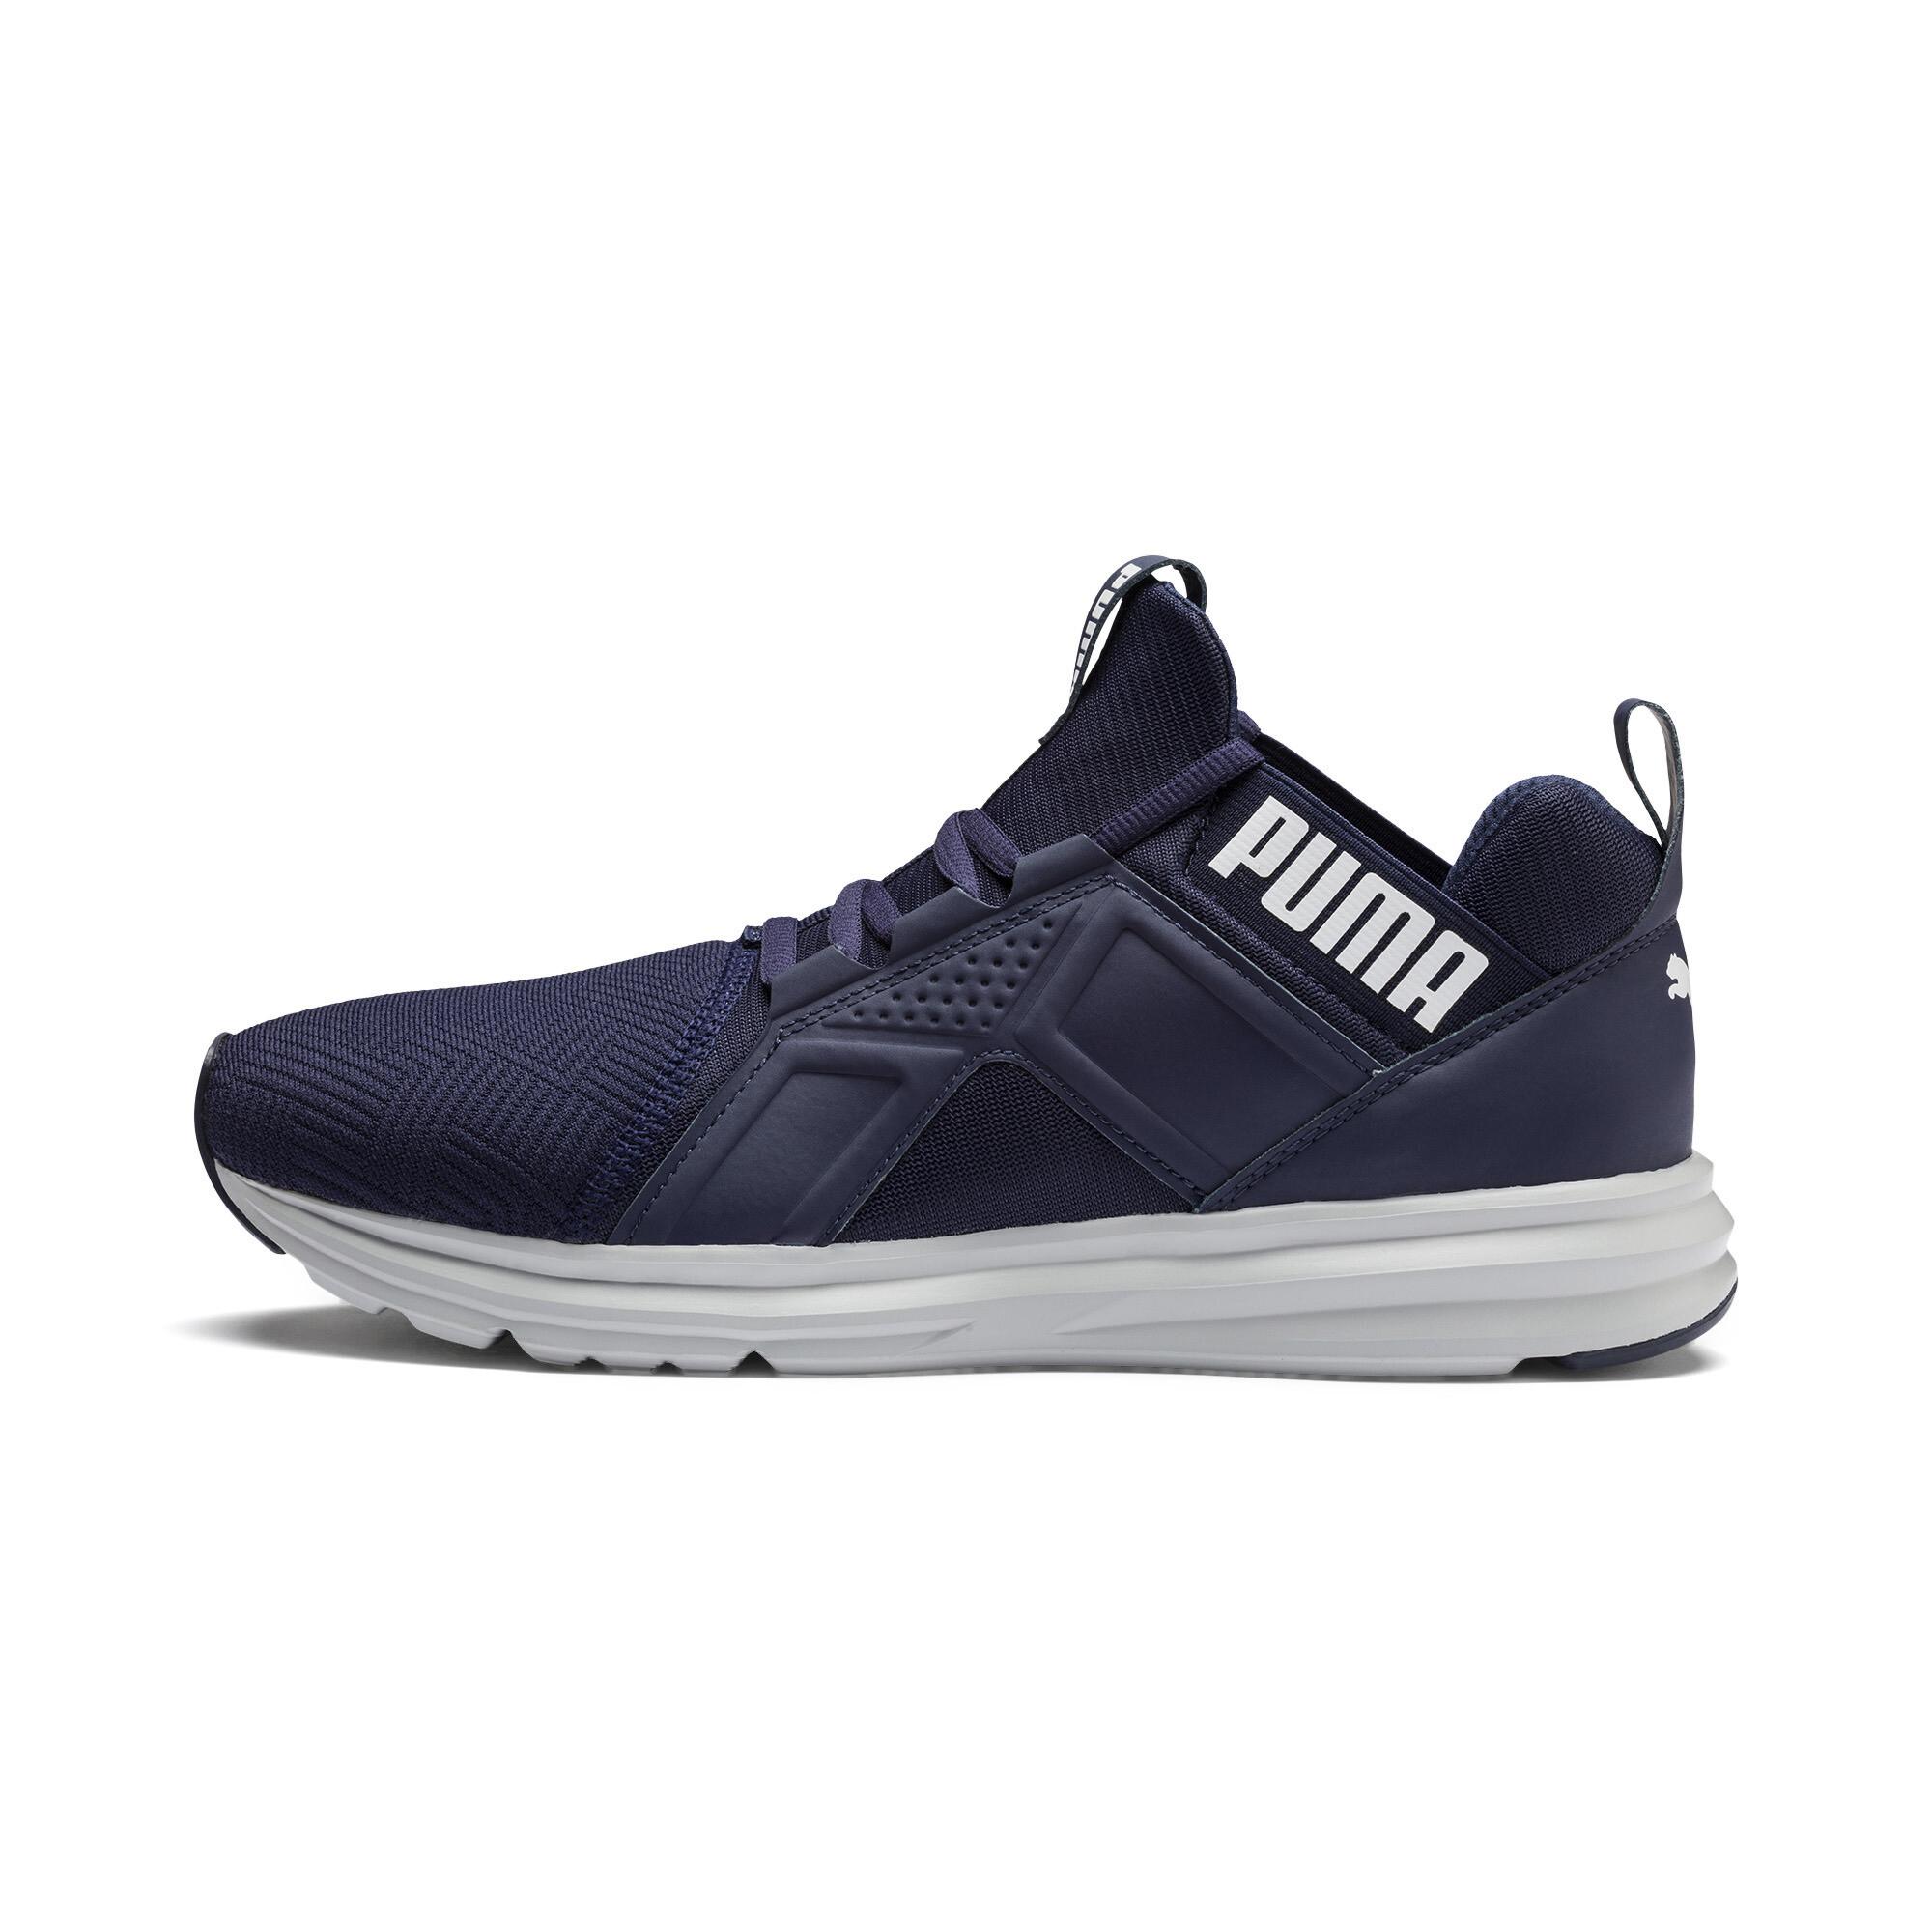 PUMA-Enzo-Geo-Men-s-Sneakers-Men-Shoe-Running thumbnail 4